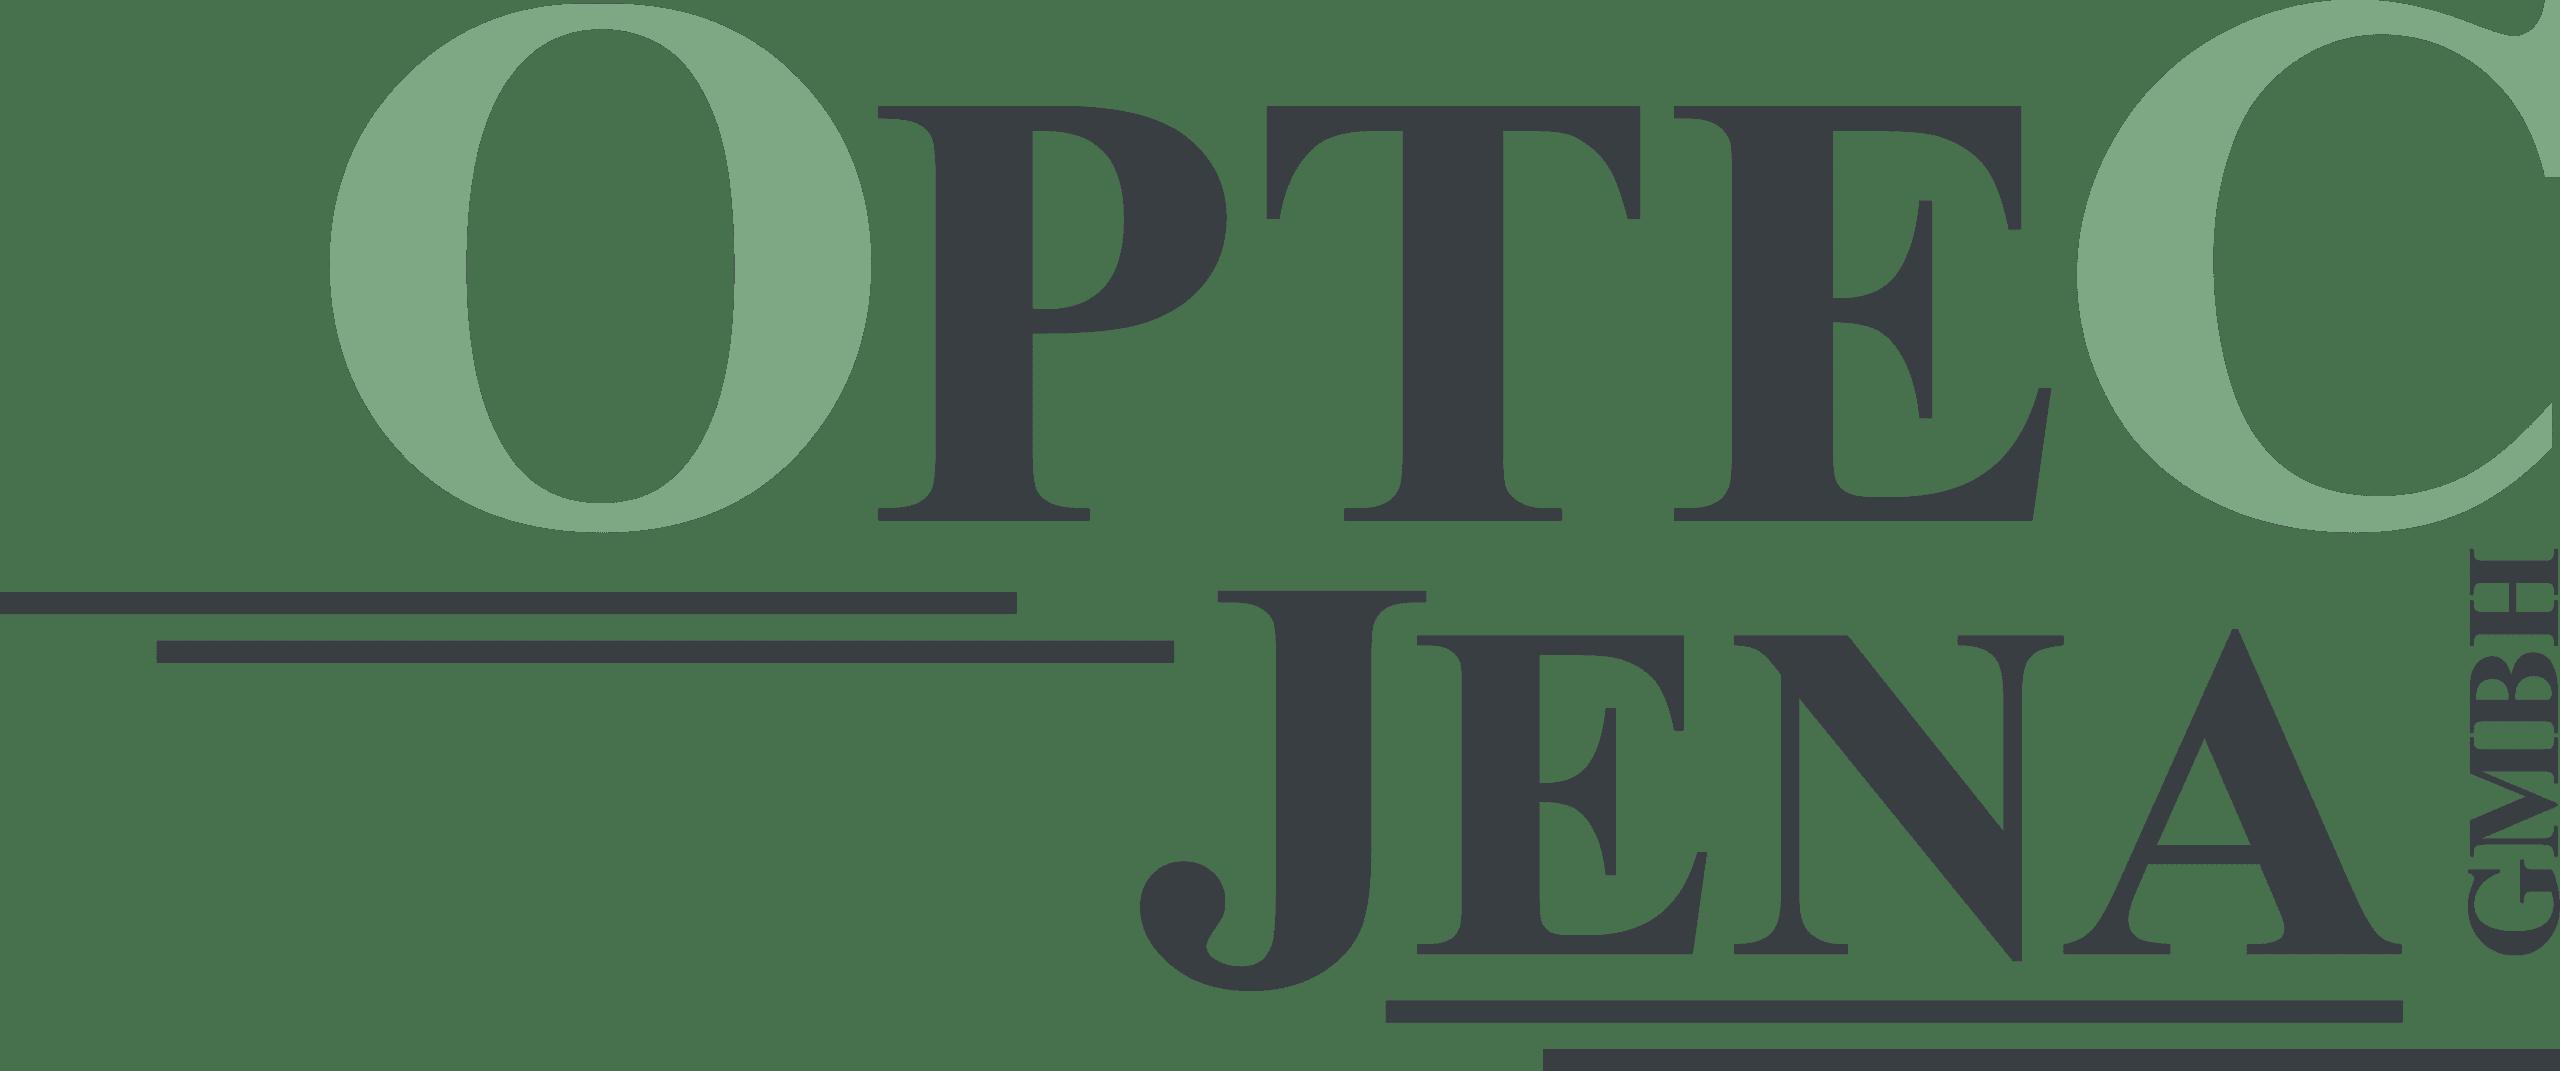 Optec Jena GmbH Logo